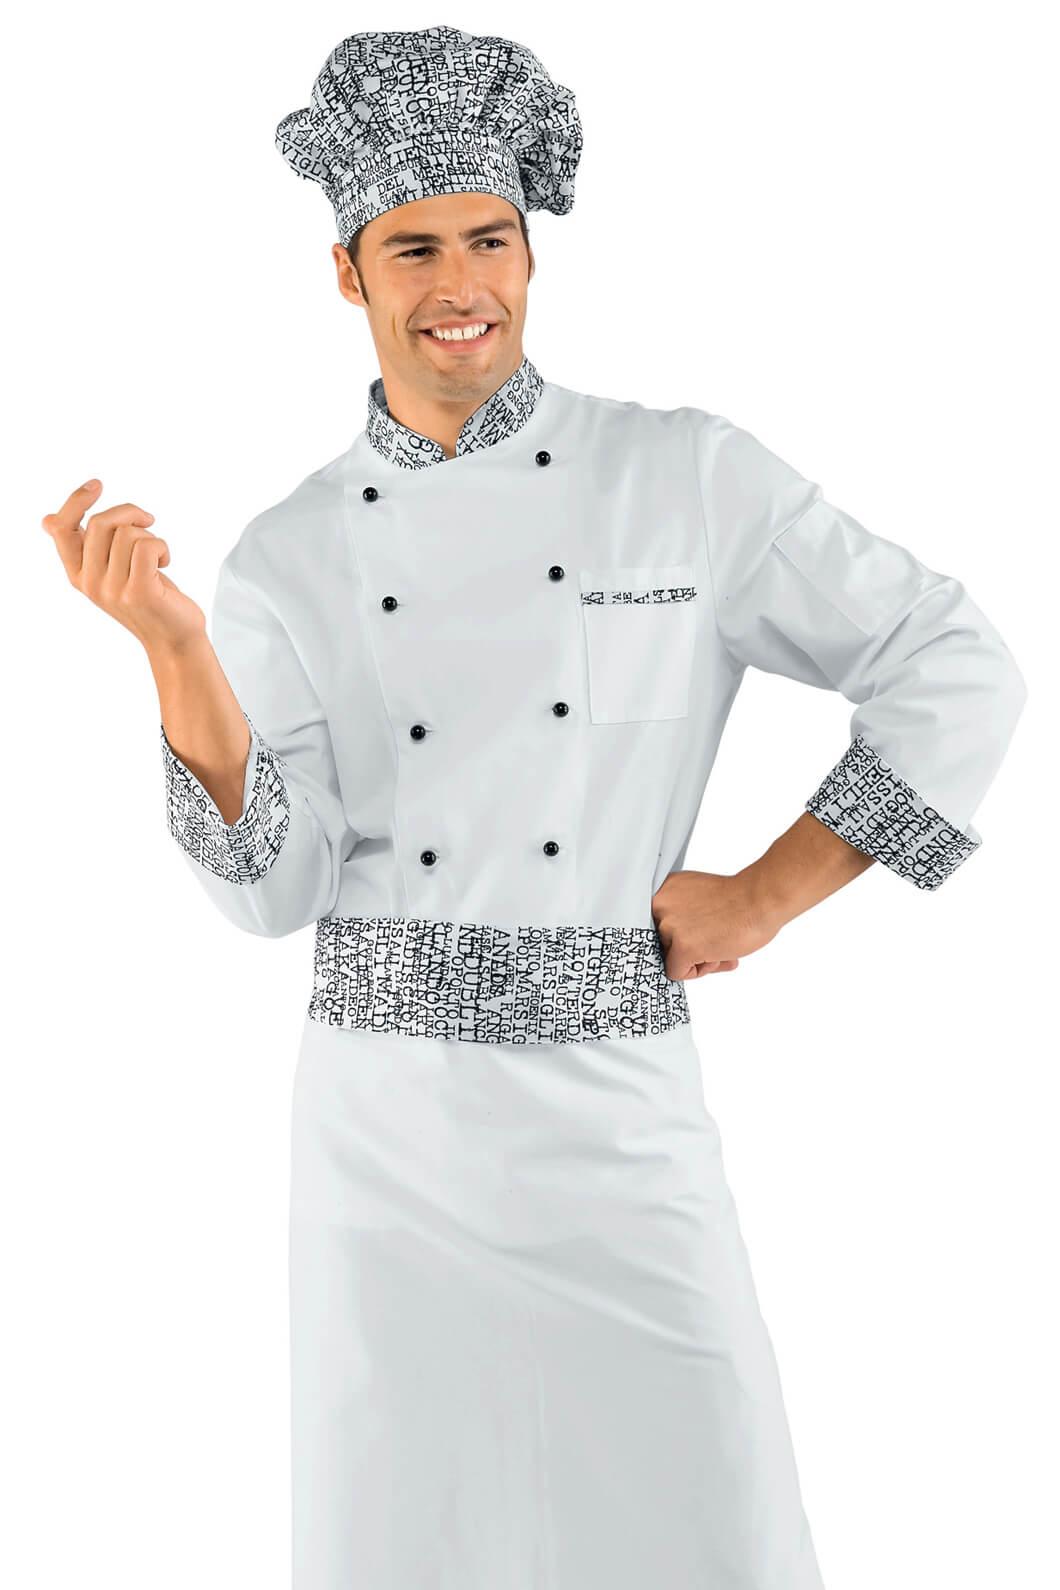 Veste chef cuisinier new york 100 coton for Cuisinier 78